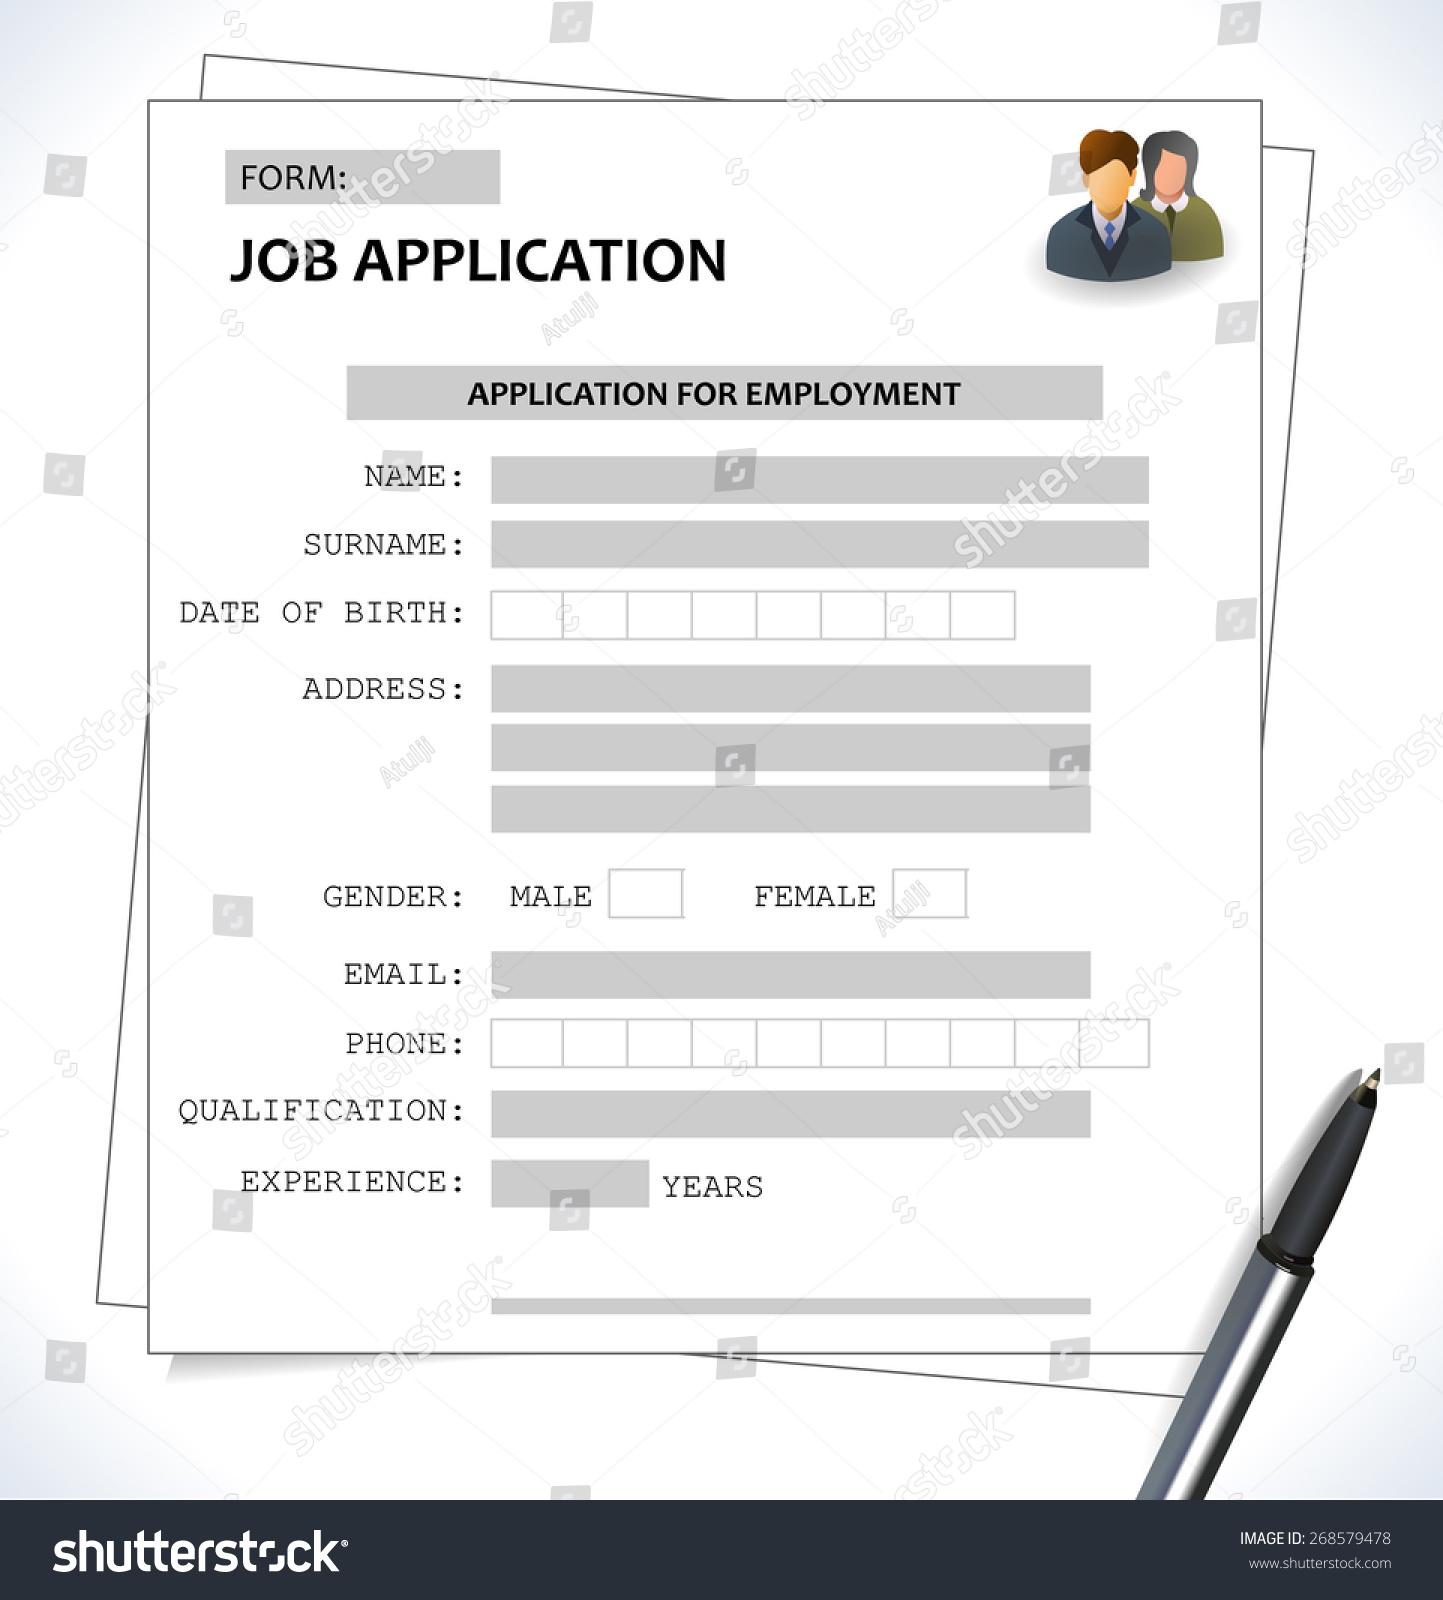 cv form sample myanmar service resume cv form sample myanmar resume and cv samples resume writing service cv form cv form english